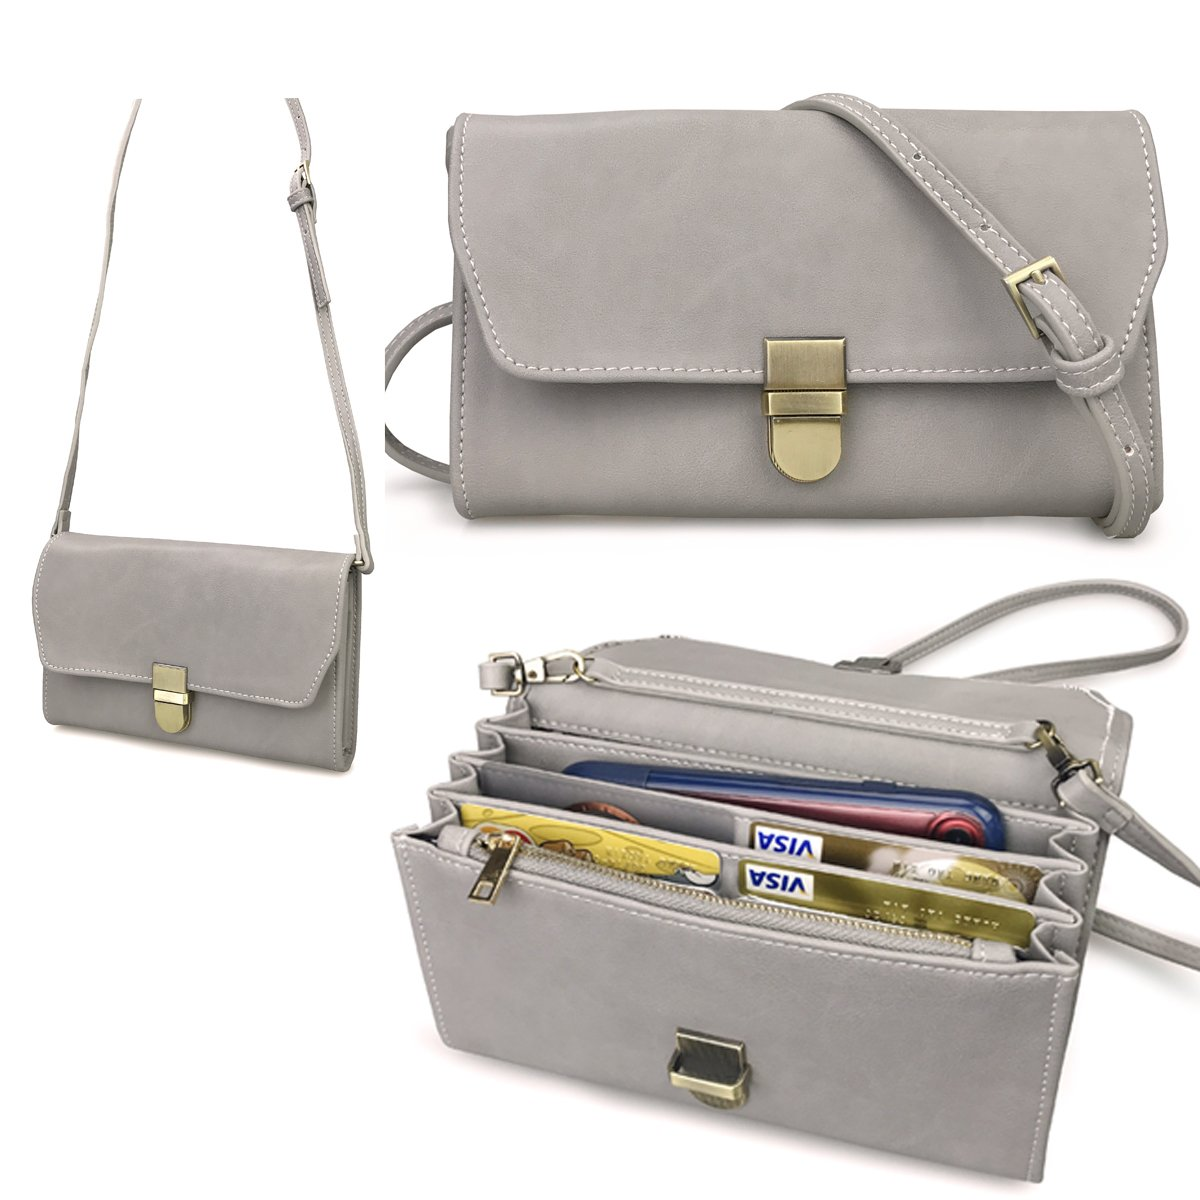 Organizer Purse Flap Top Cross Body Bag Womens Smartphone Wallet (Gray)